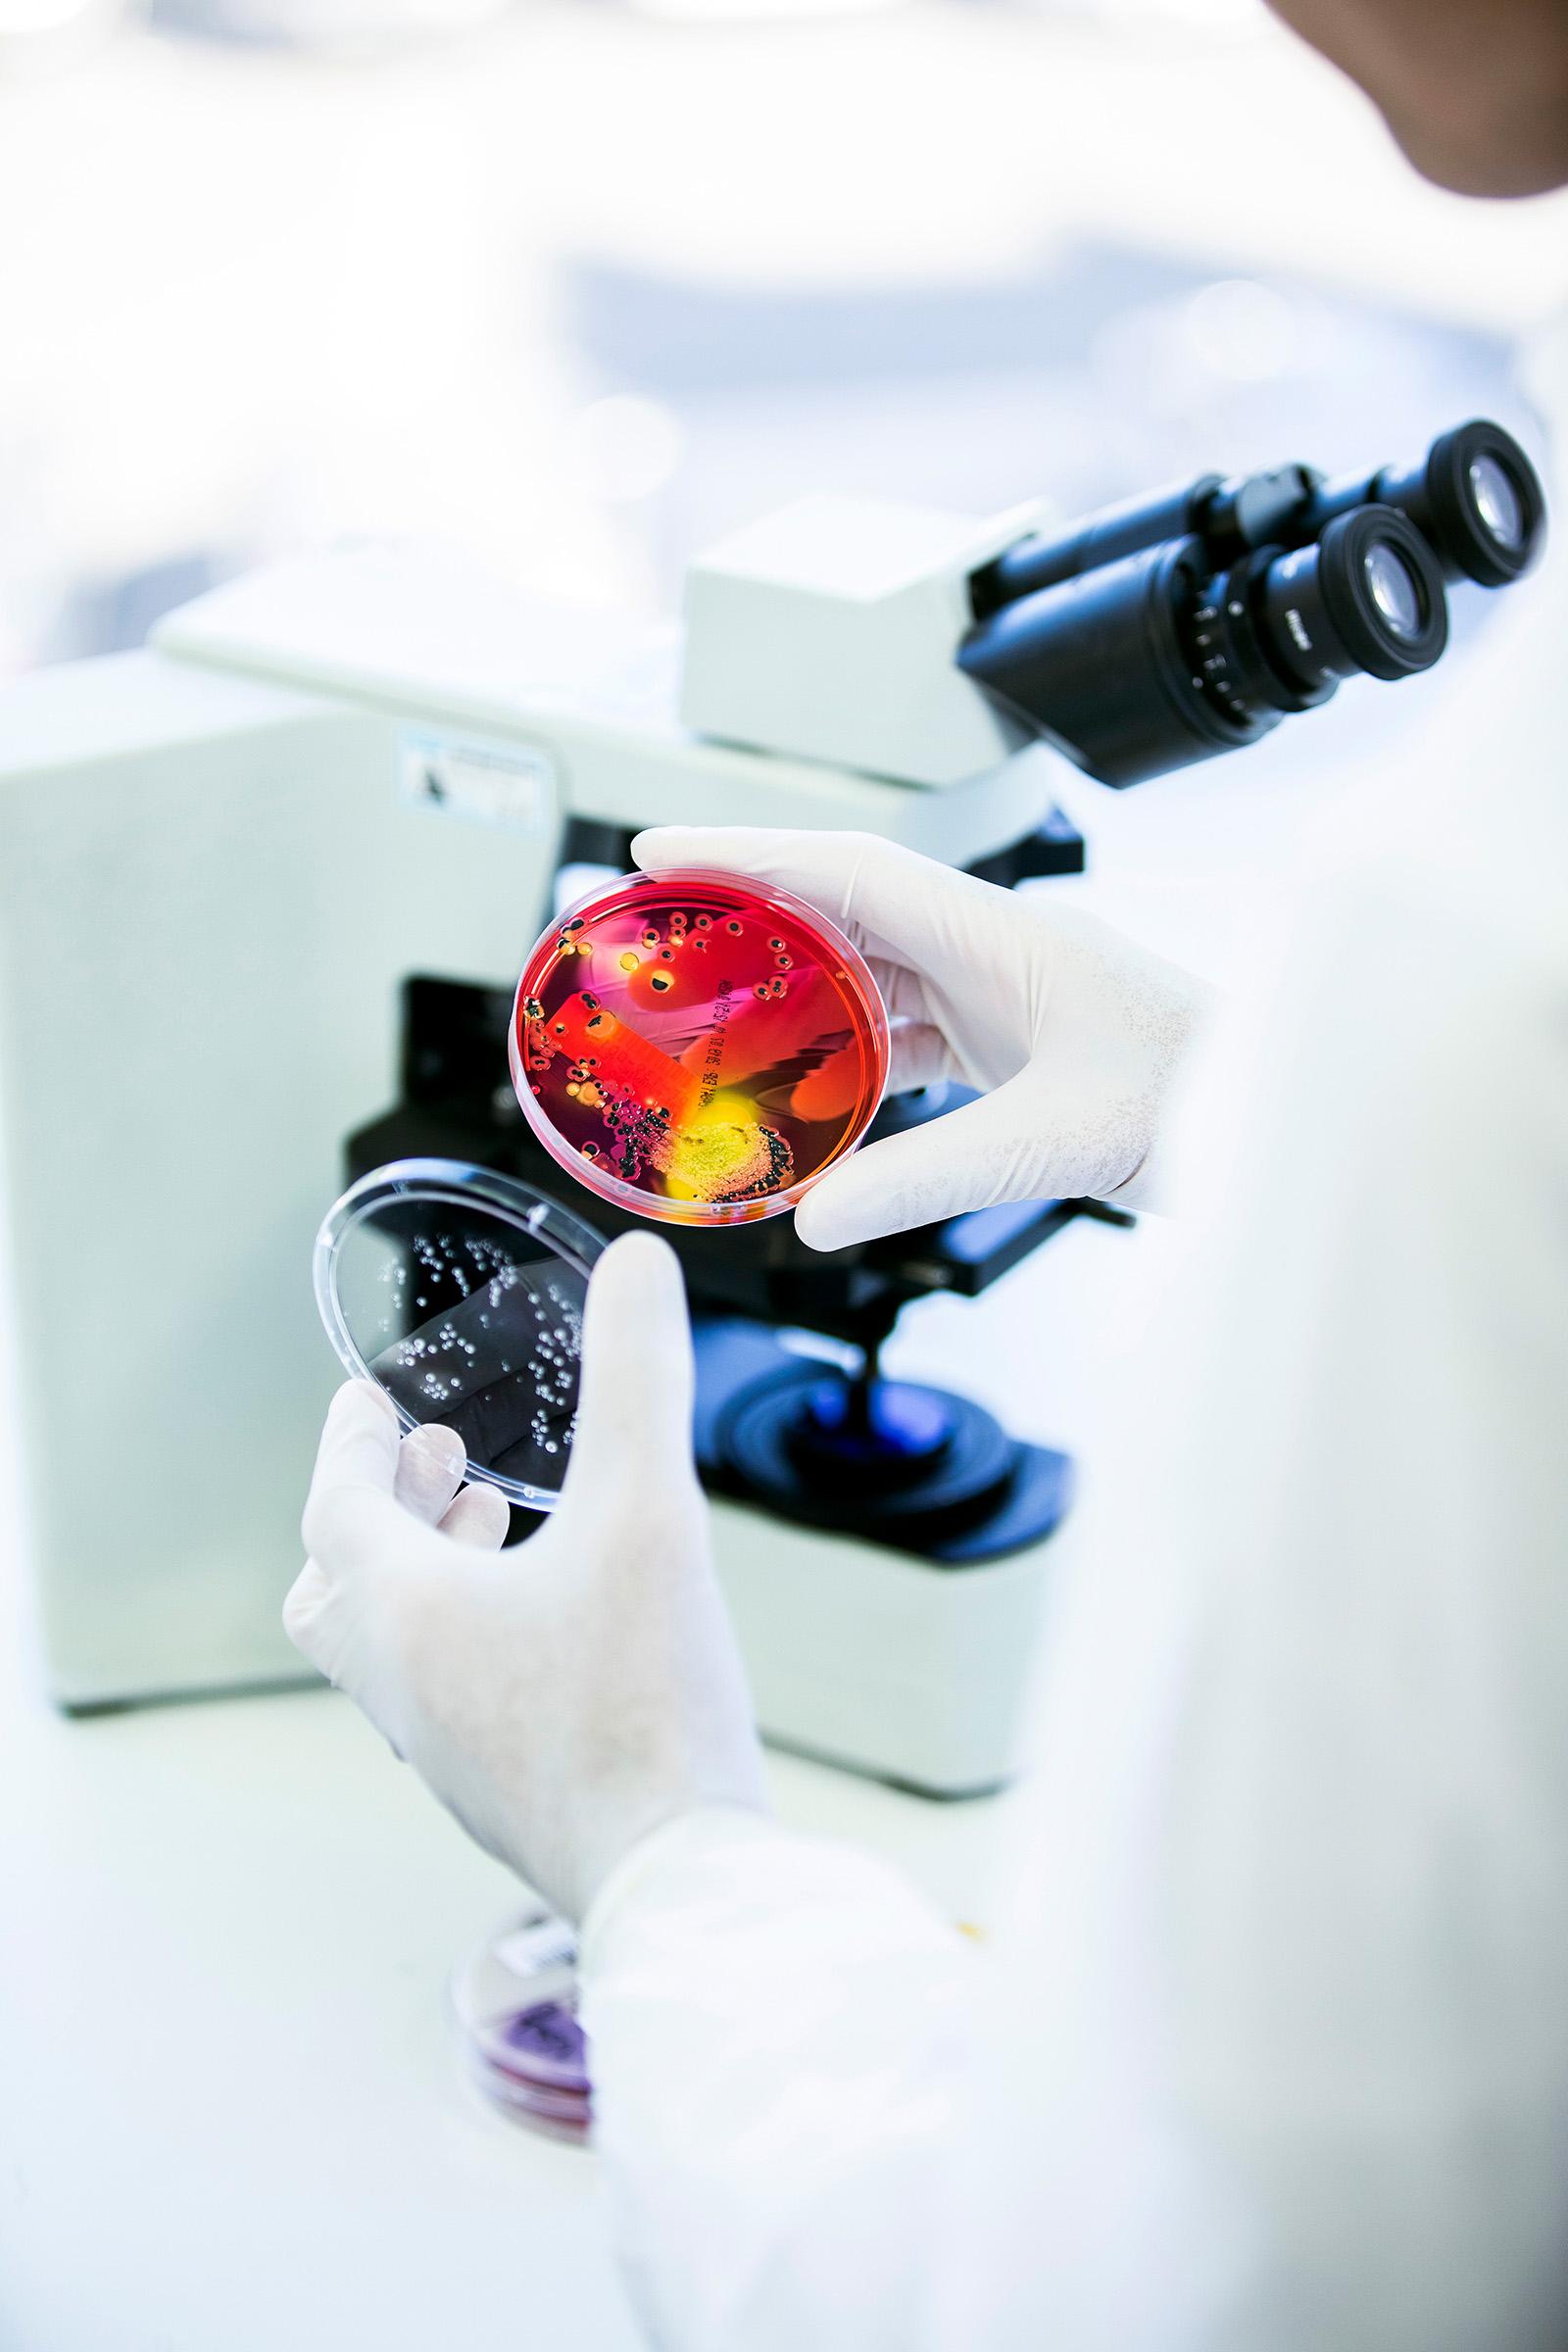 Labratory medical editorial photography Sonic Healthcare Douglass Hanly Moir Pathology Pathologist Doctor Petri dish bacteria Microscope